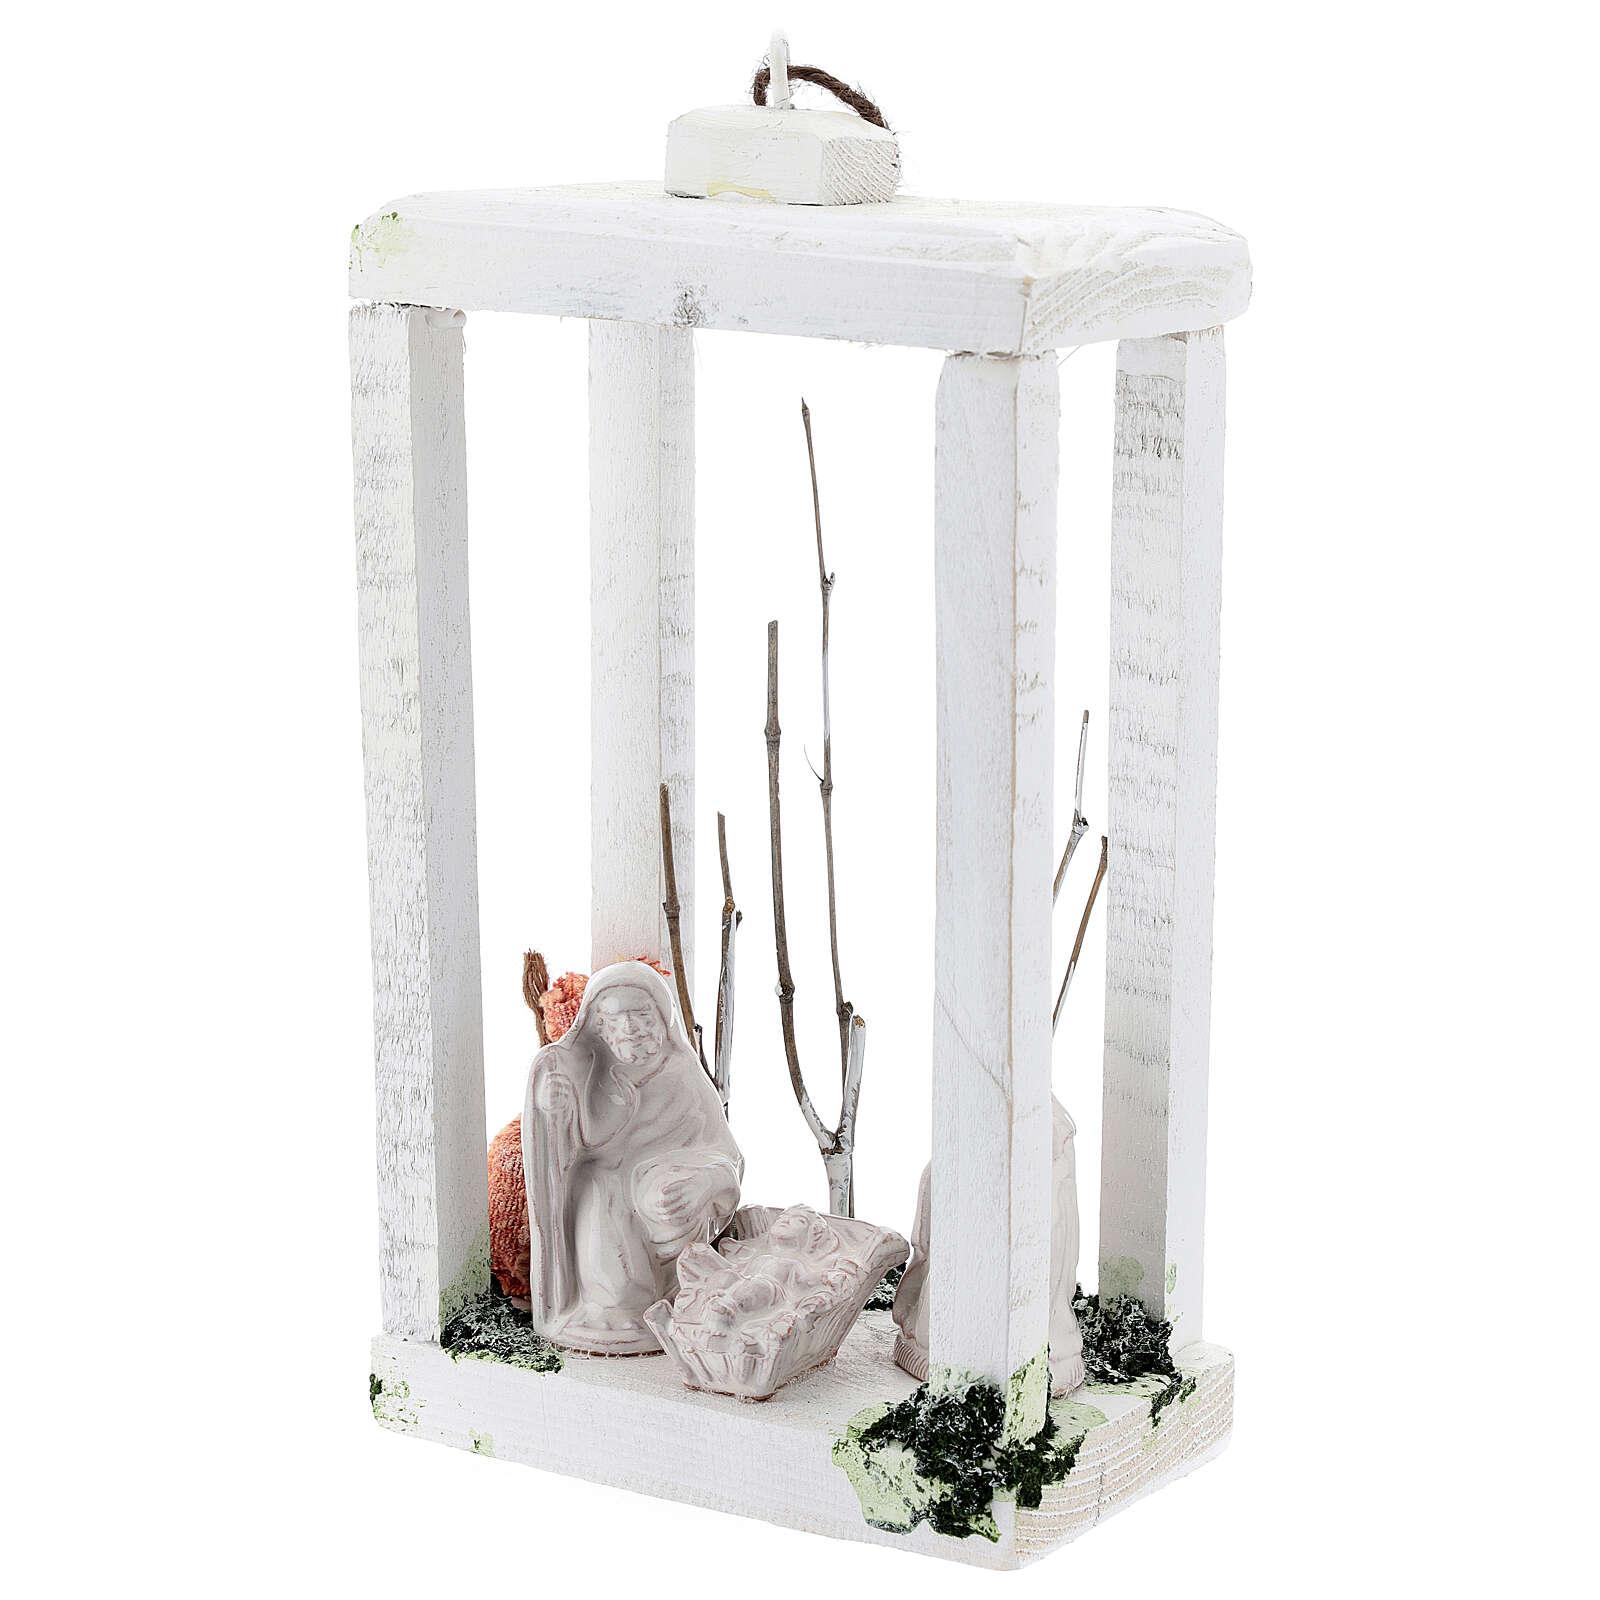 Lanterna legno Natività  8 cm terracotta Deruta bianca 23x15x10 4